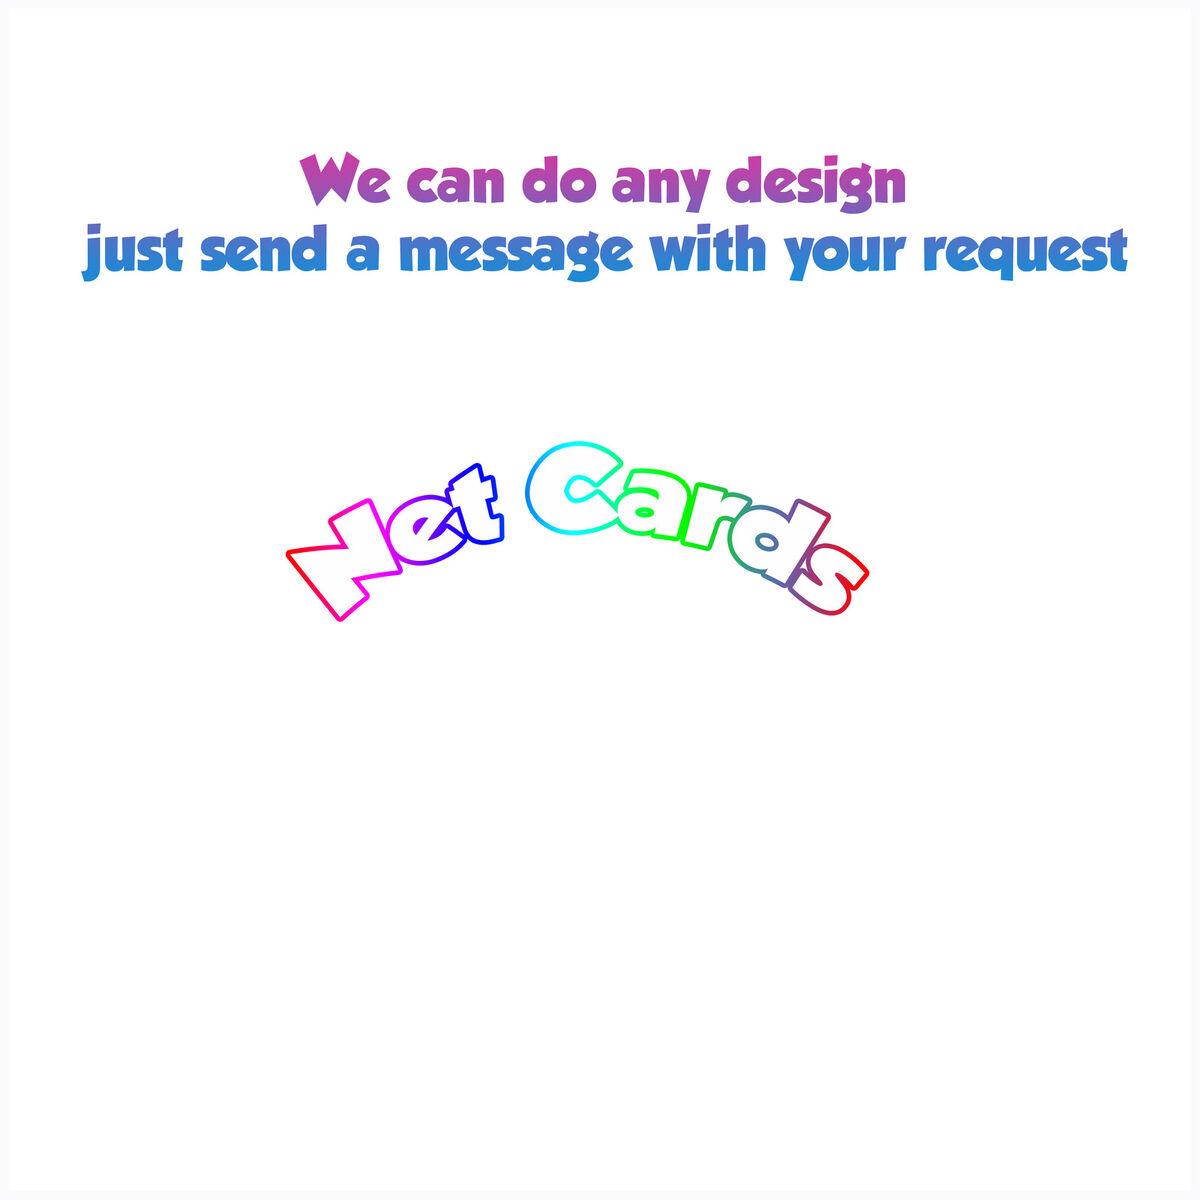 Netttcards